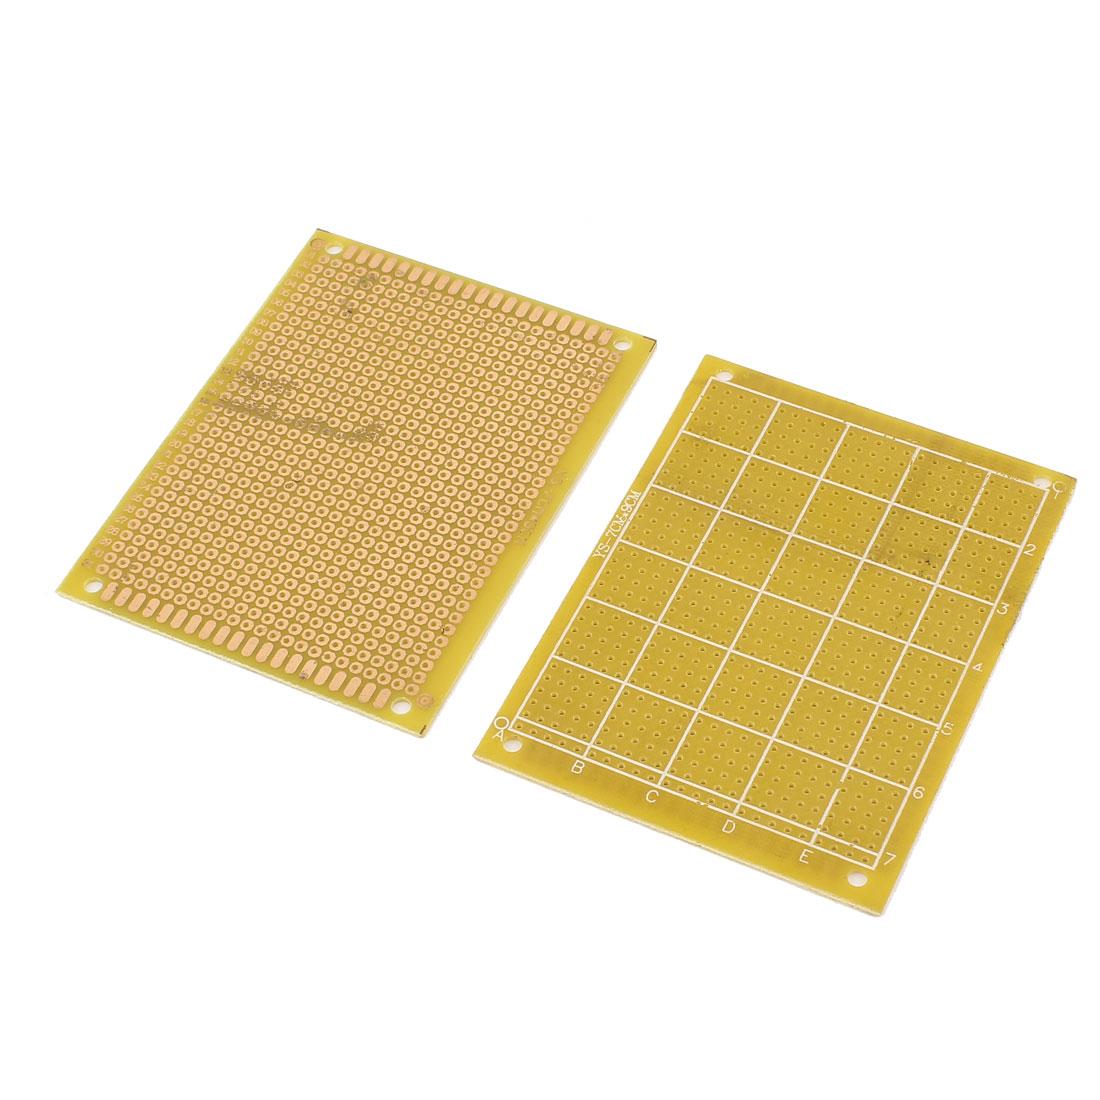 2pcs 7cm x 9cm FR4 DIY Copper Printed Universal Prototype Paper PCB Board